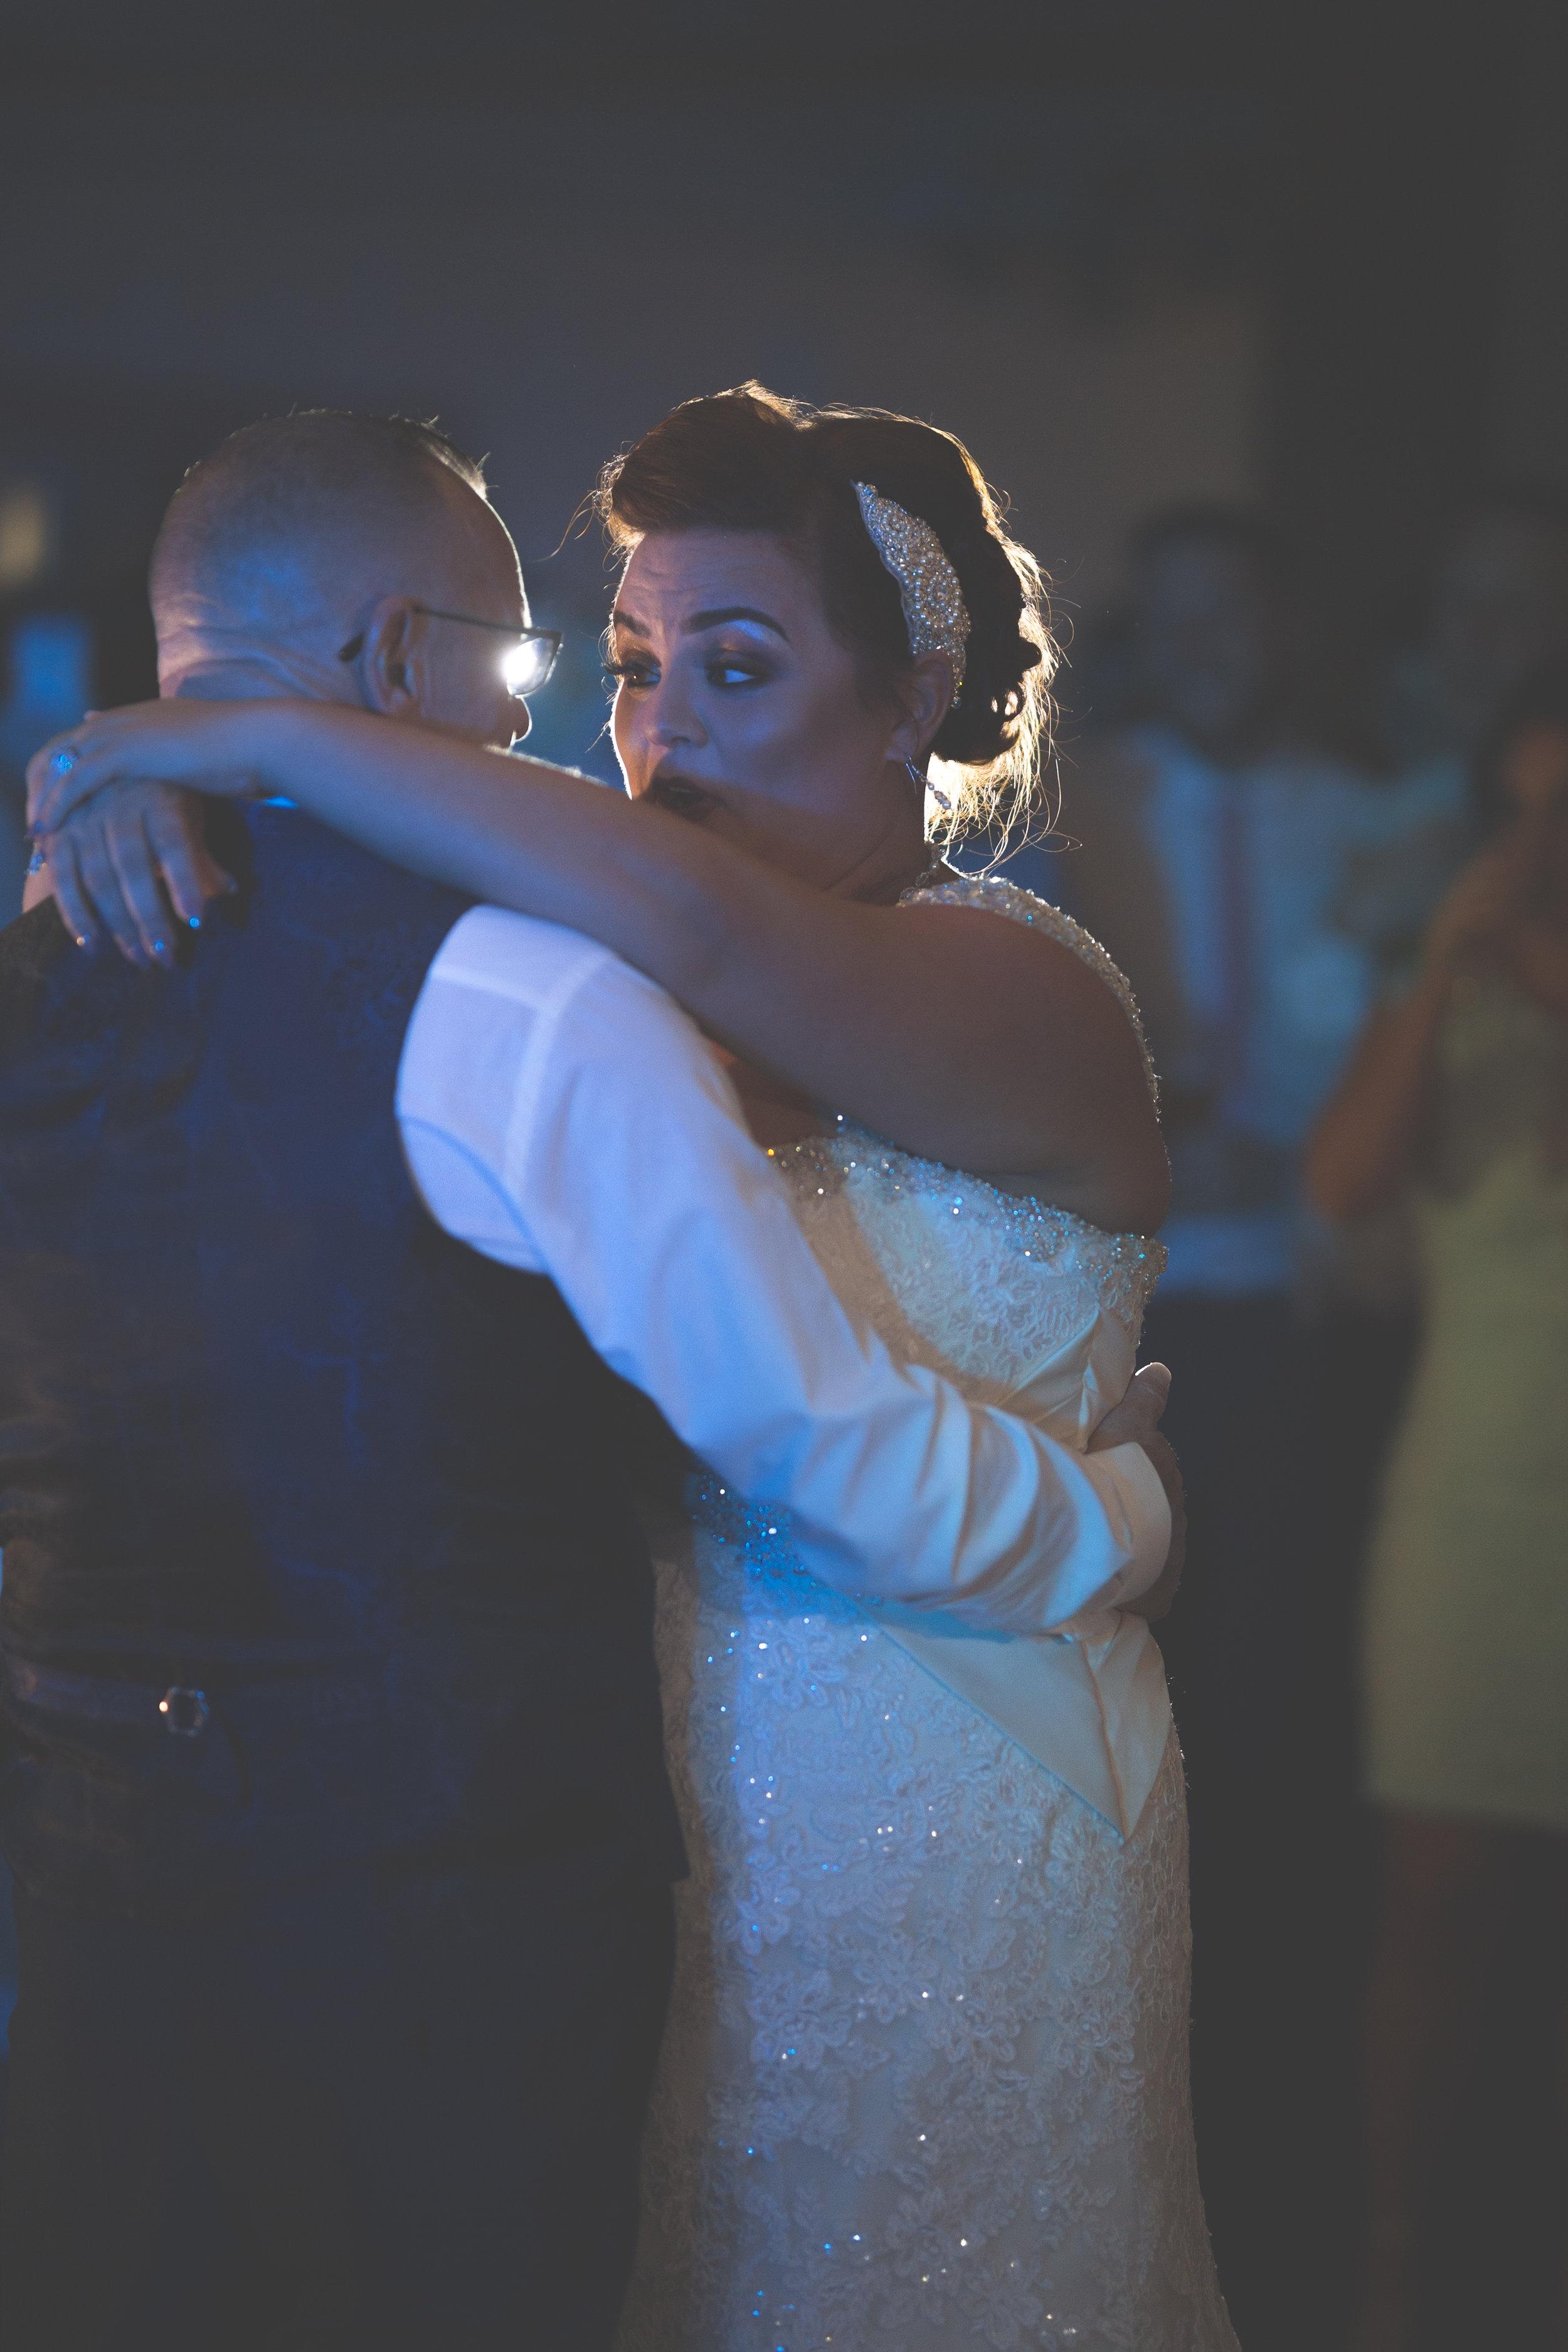 Antoinette & Stephen - First Dance | Brian McEwan Photography | Wedding Photographer Northern Ireland 37.jpg